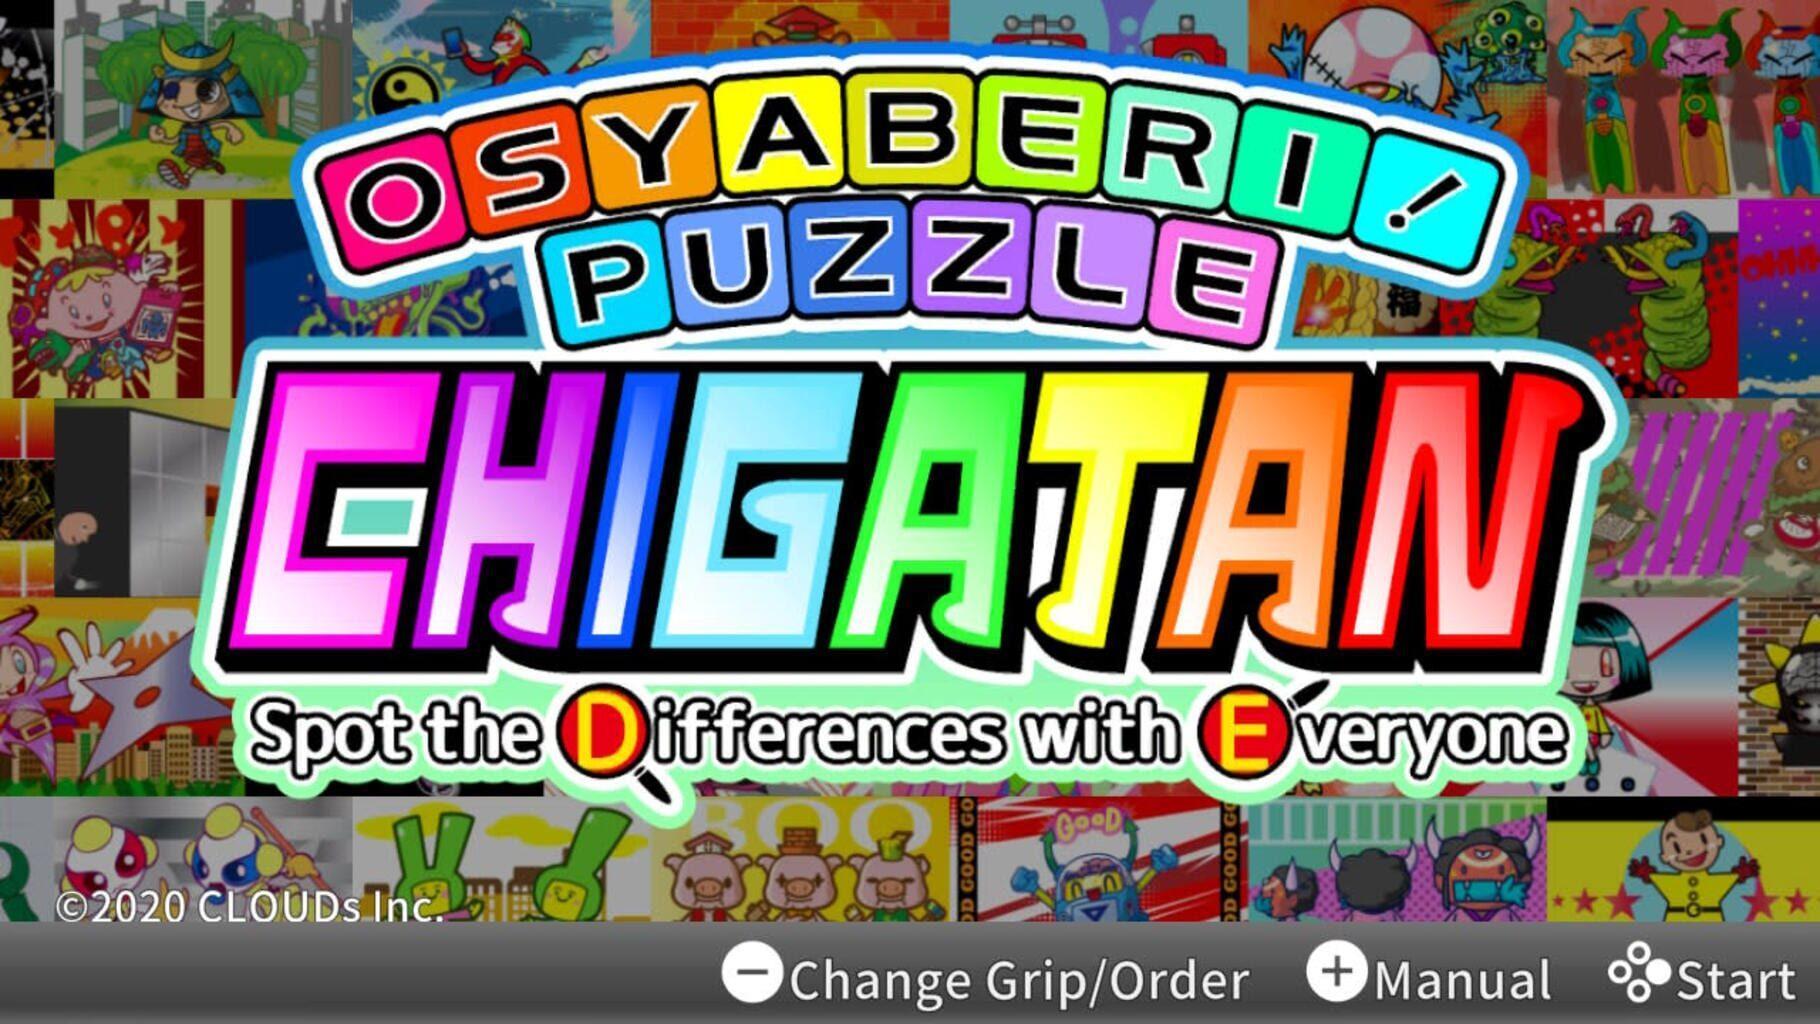 拼图找茬(Osyaberi! Puzzle Chigatan)插图4